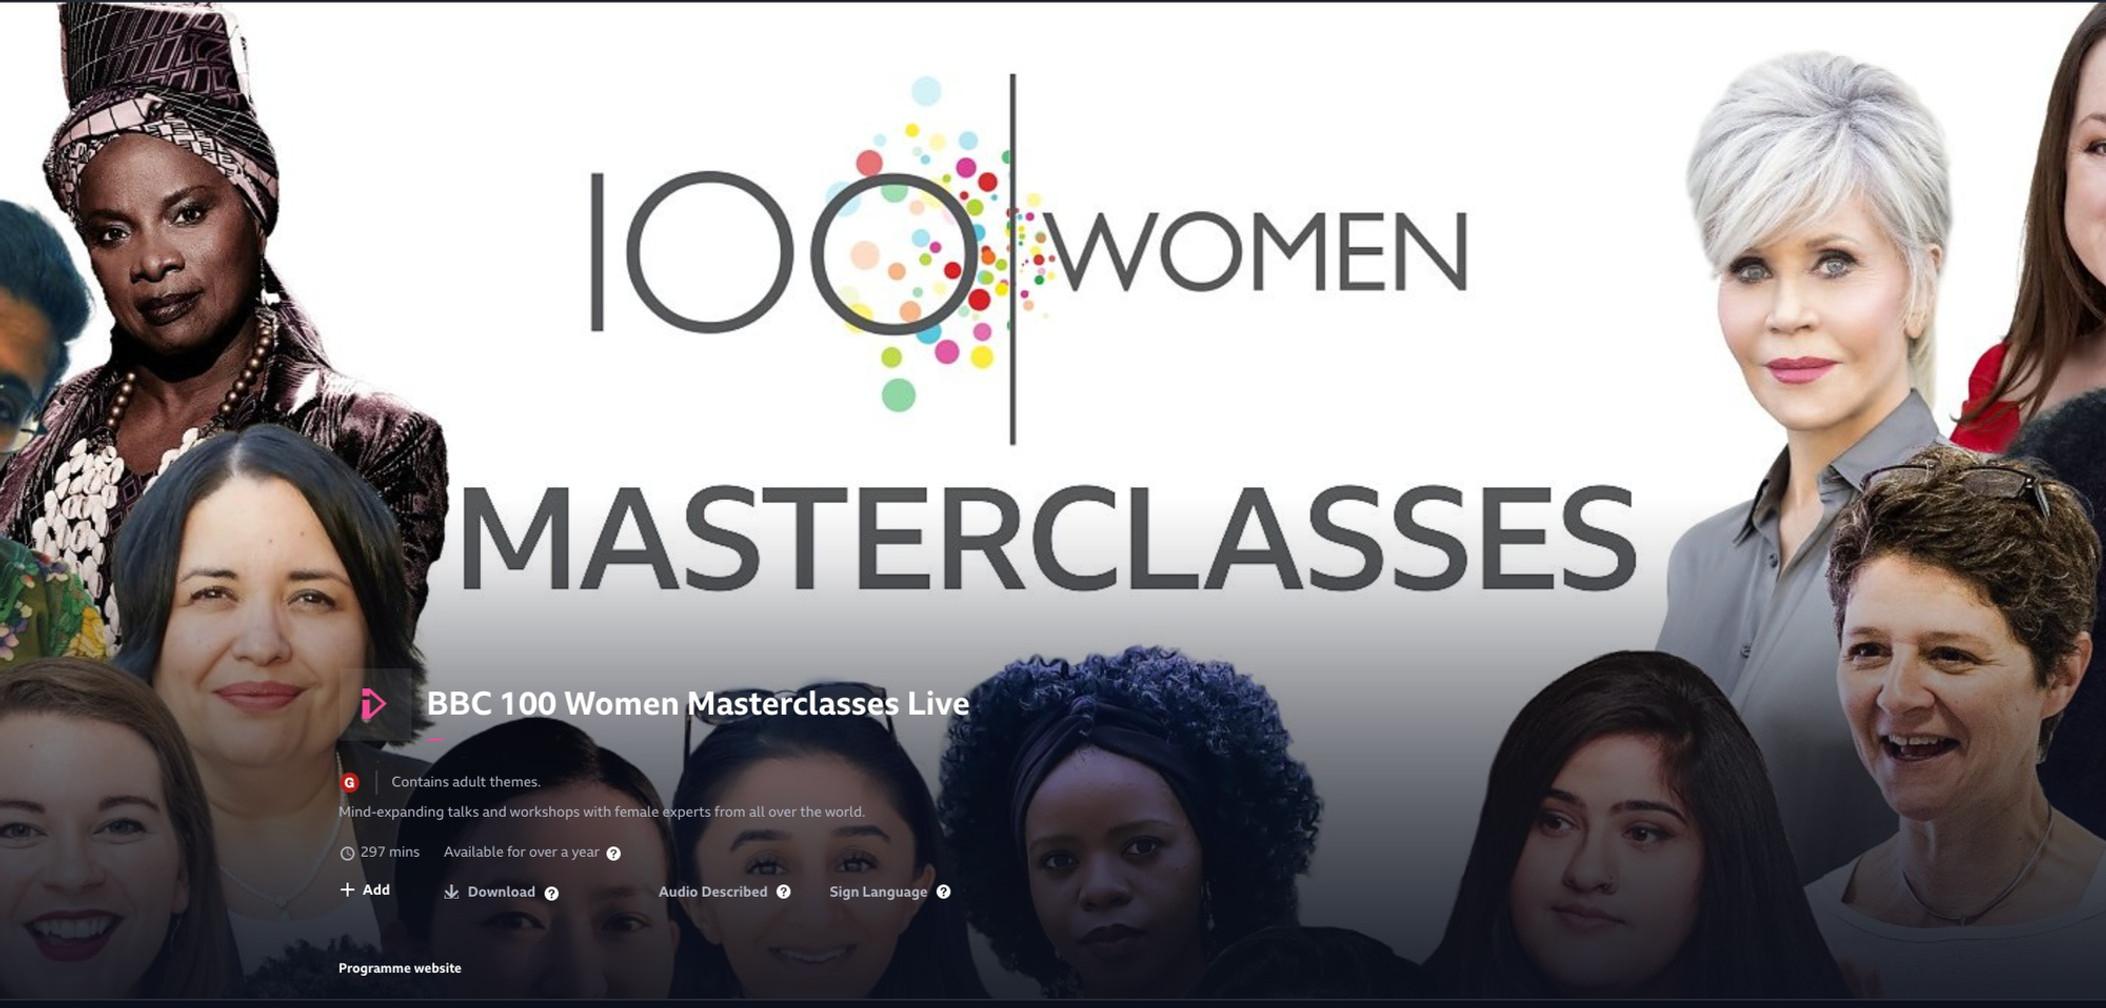 BBC 100 Women Season 2020